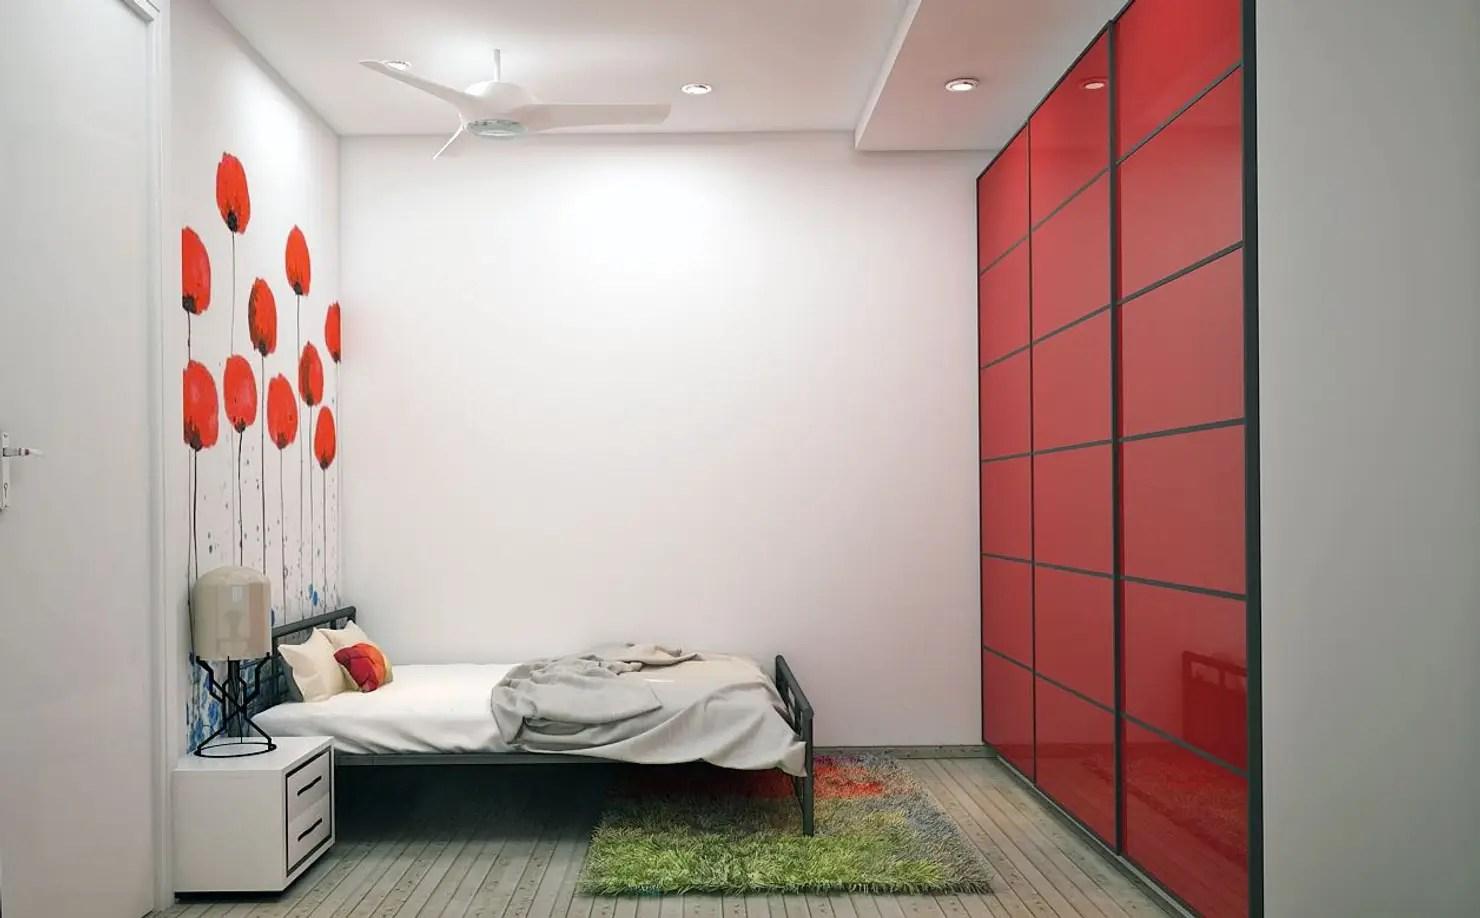 Bedroom Designs From Professionals In Hyderabad  Home Design